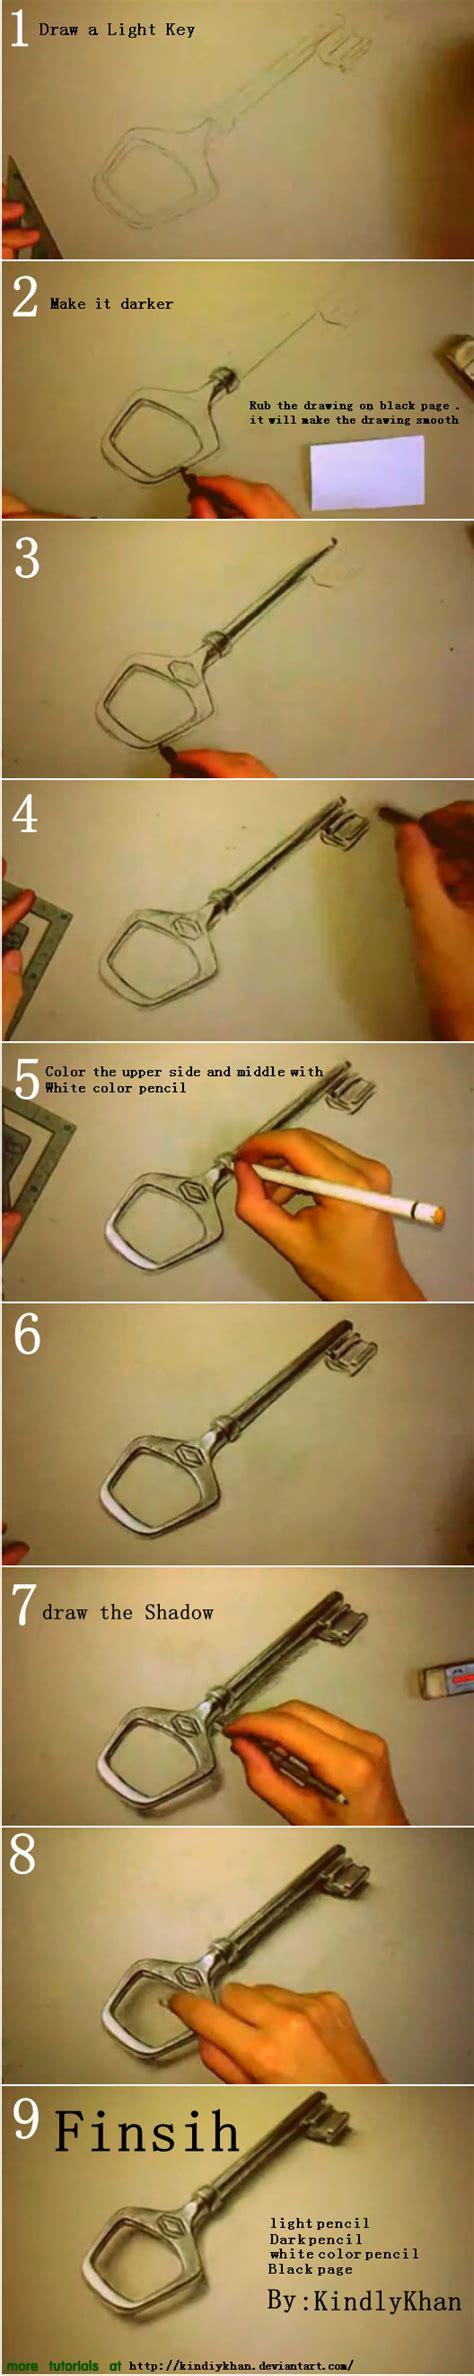 tutorial gambar 3d pencil 3d key pencil drawing tutorial by kindiykhan on deviantart